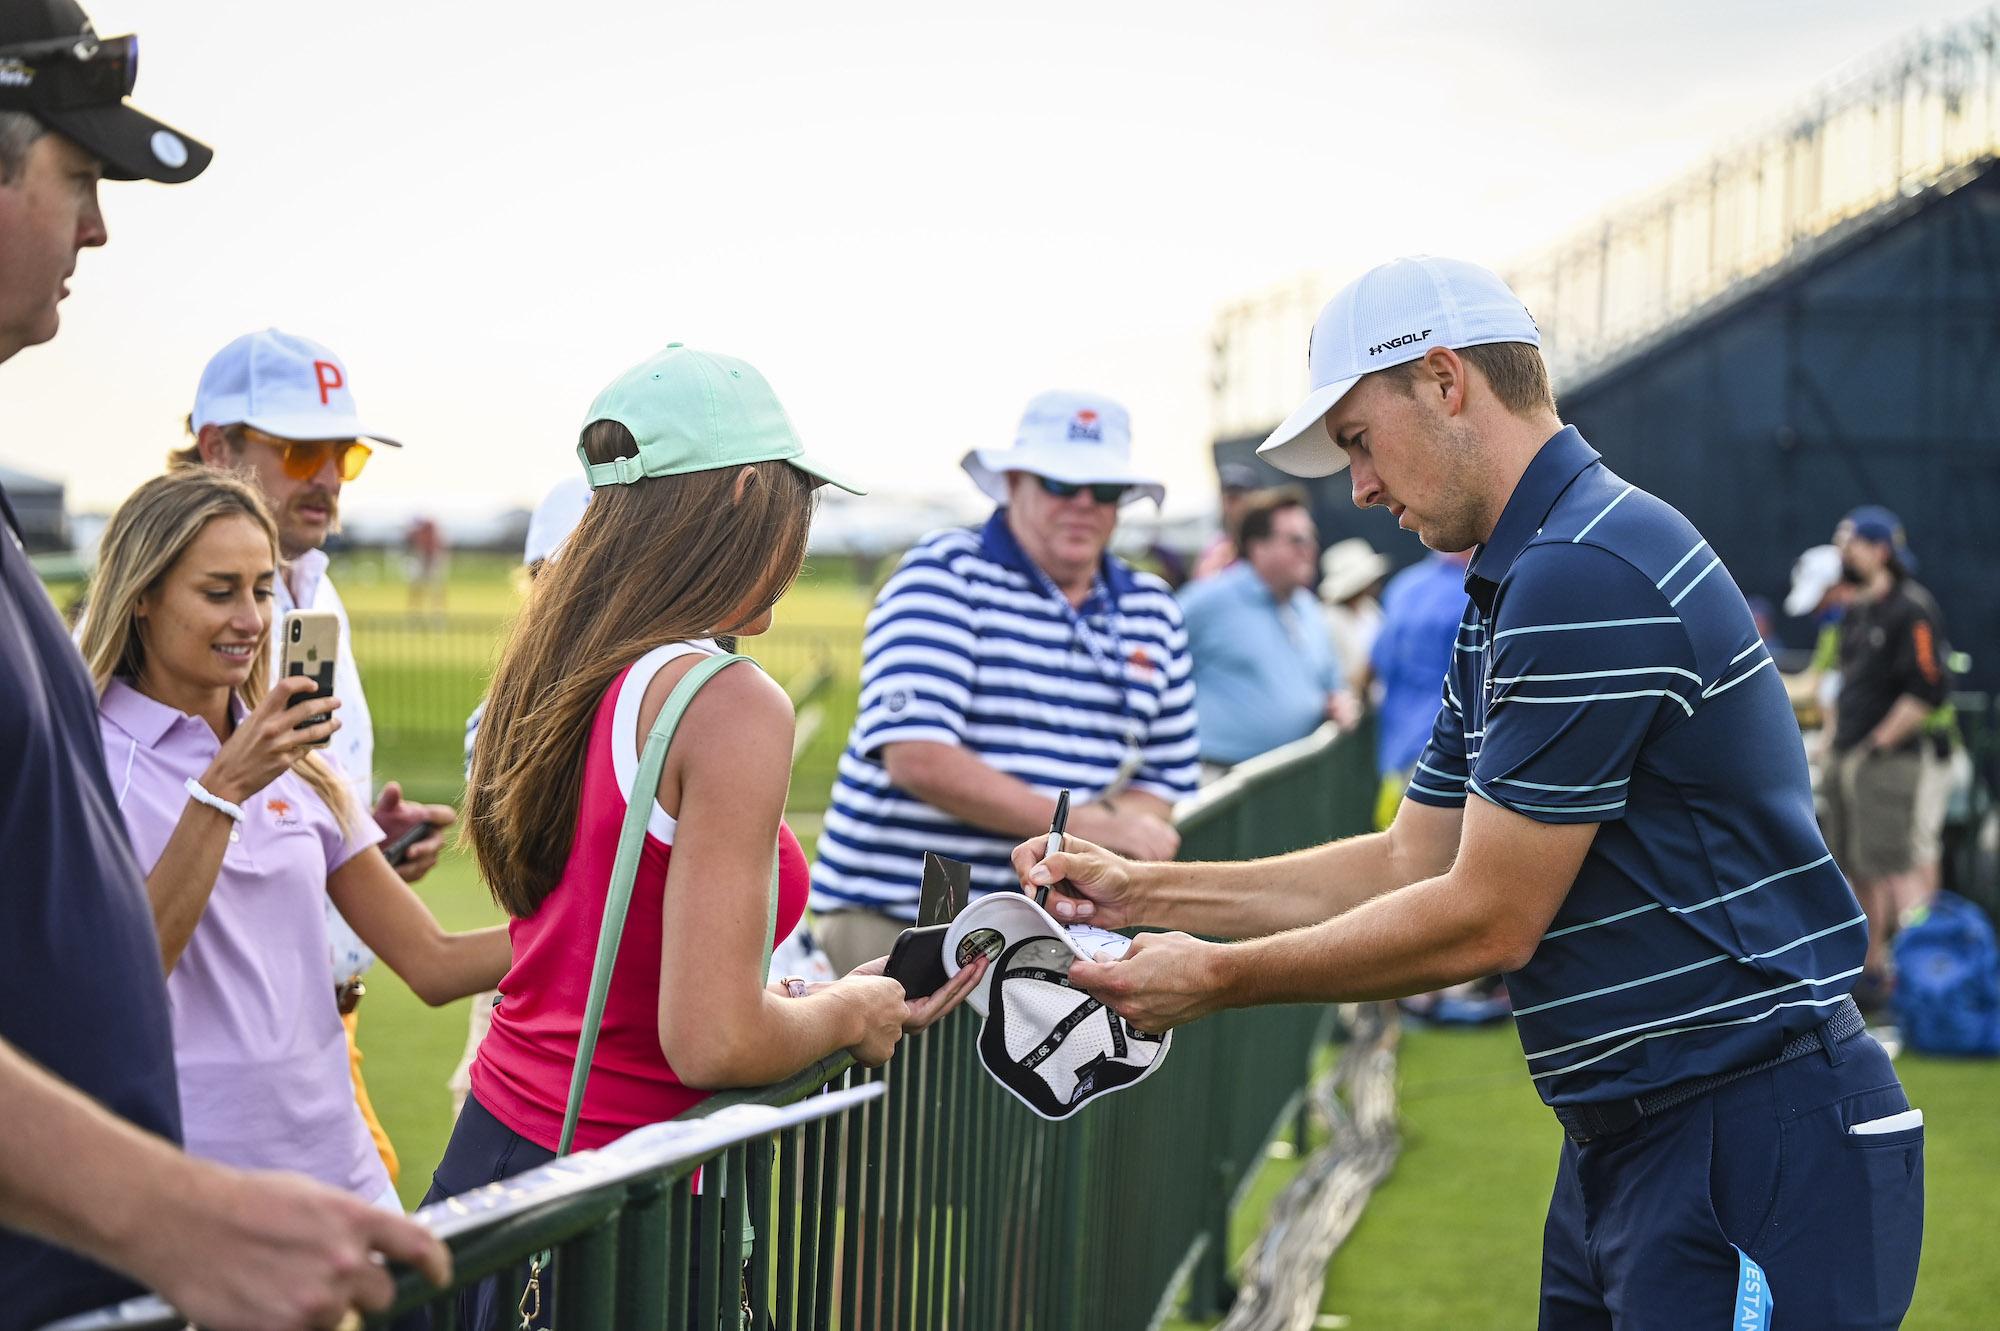 2021 PGA Championship: Preview Day 1 - Jordan Signs Autographs for Fans